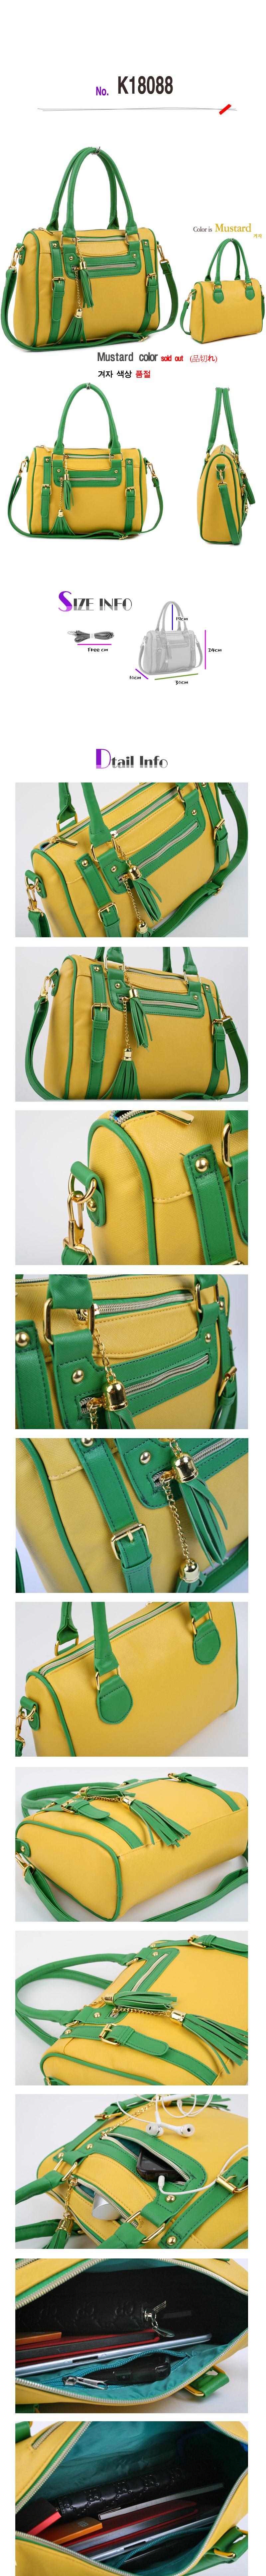 shiulder&tote bag no. K18088view